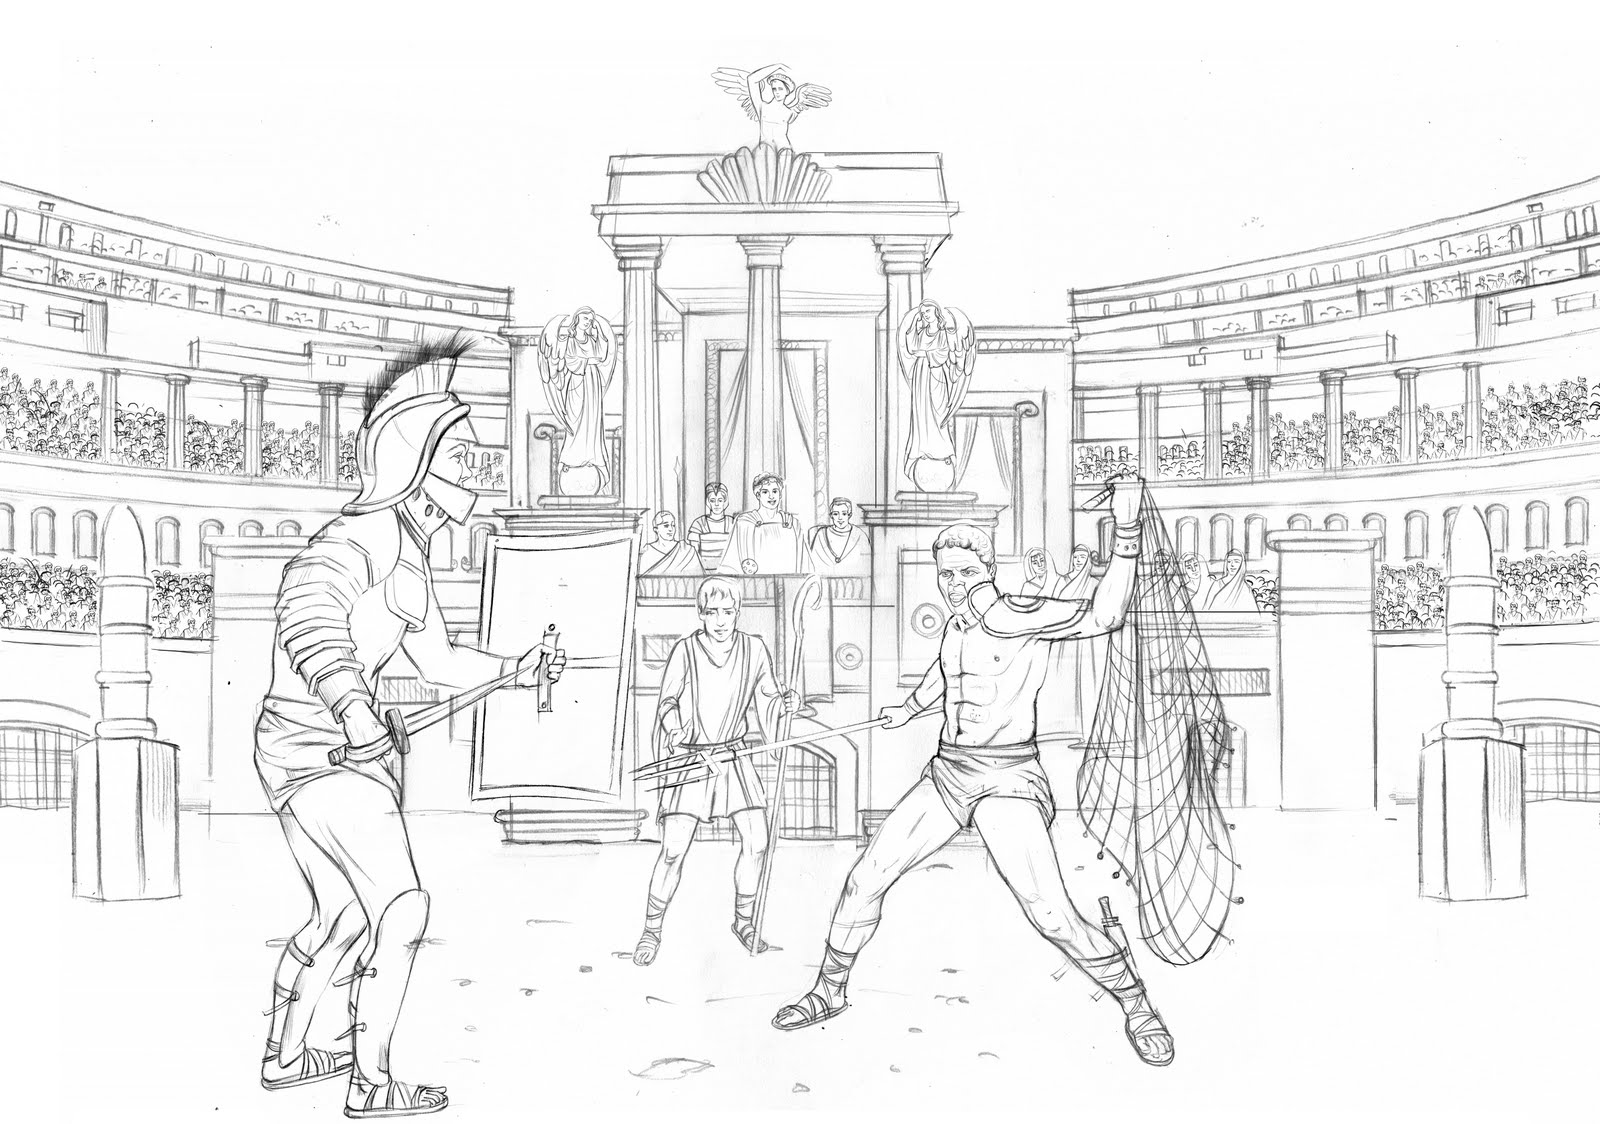 Gladiator Drawing Posted by sohom at 1:36 am no